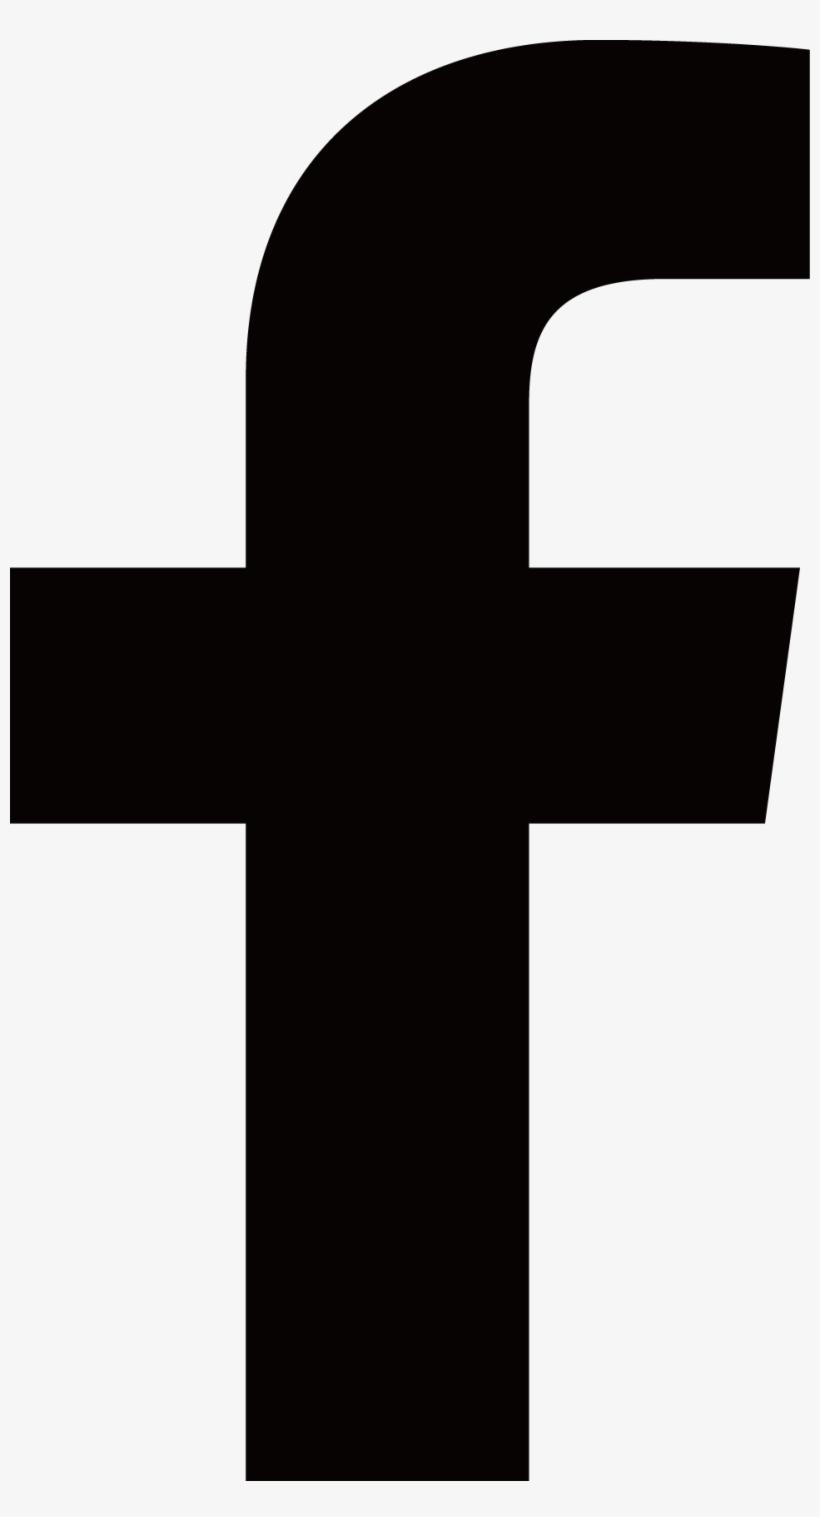 Facebook clipart svg. Transparent background black icon